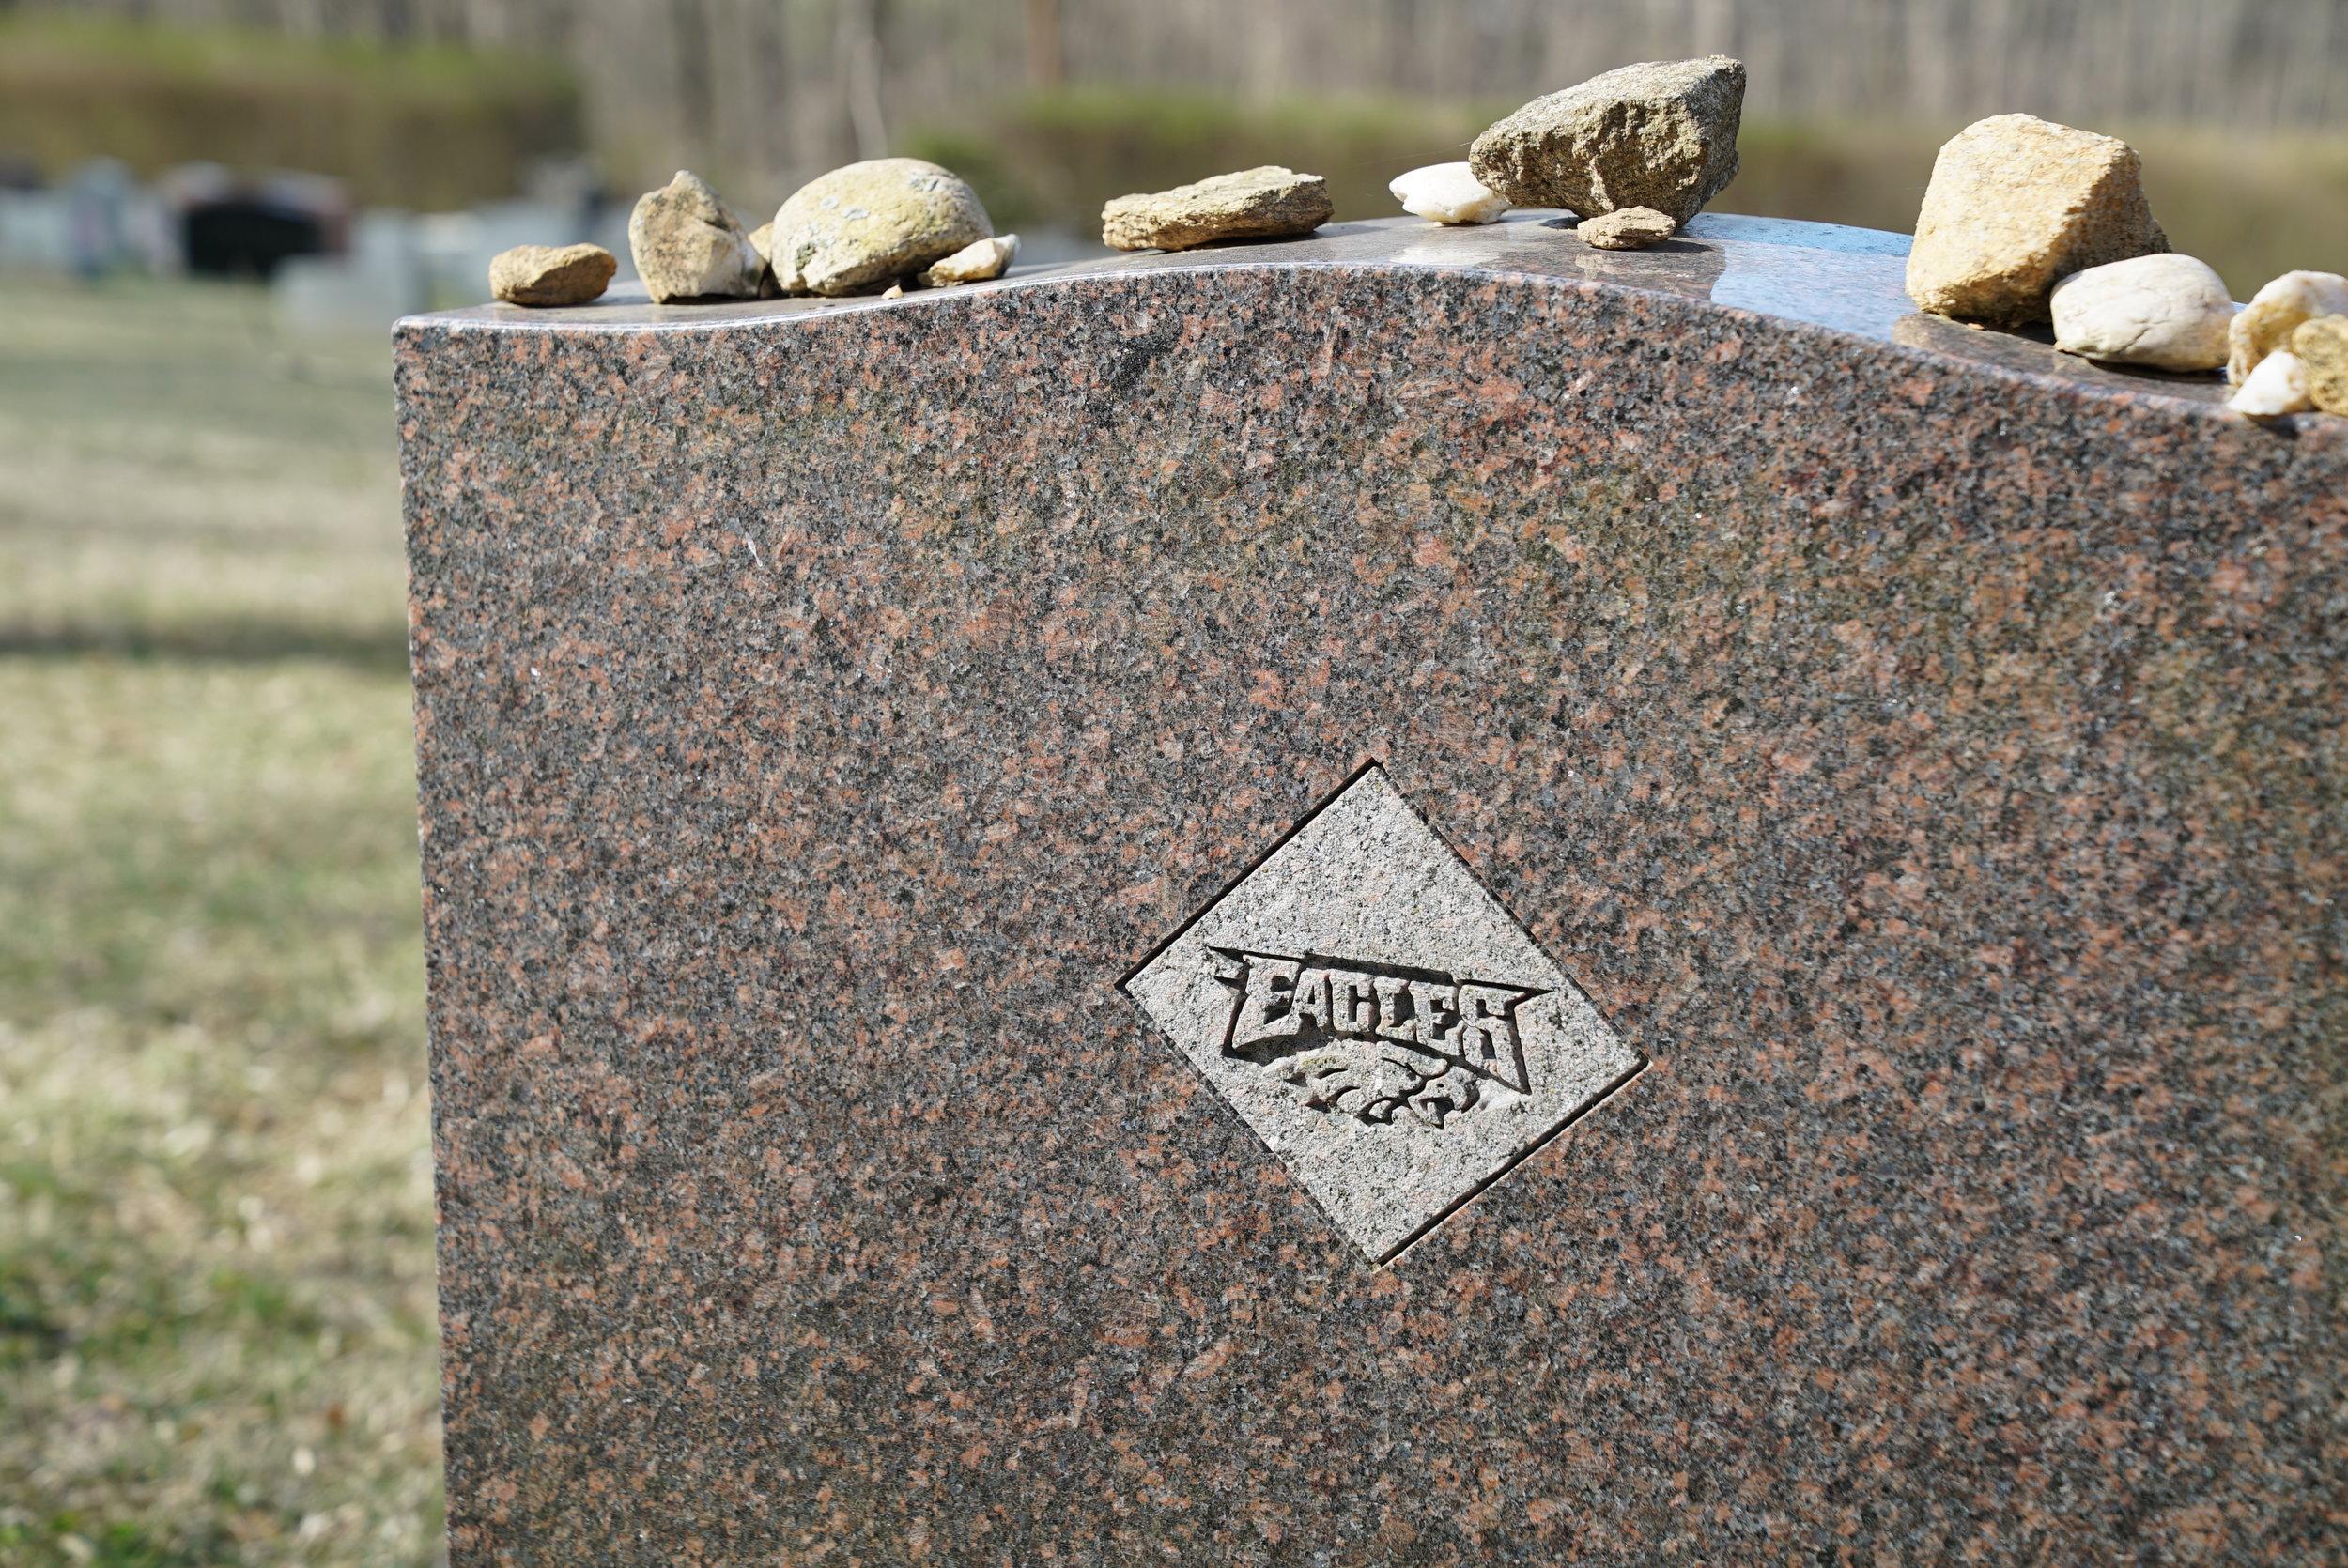 Somebody was a big Eagles fan. Beth Israel Cemetery. Coatesville, Pennsylvania area.